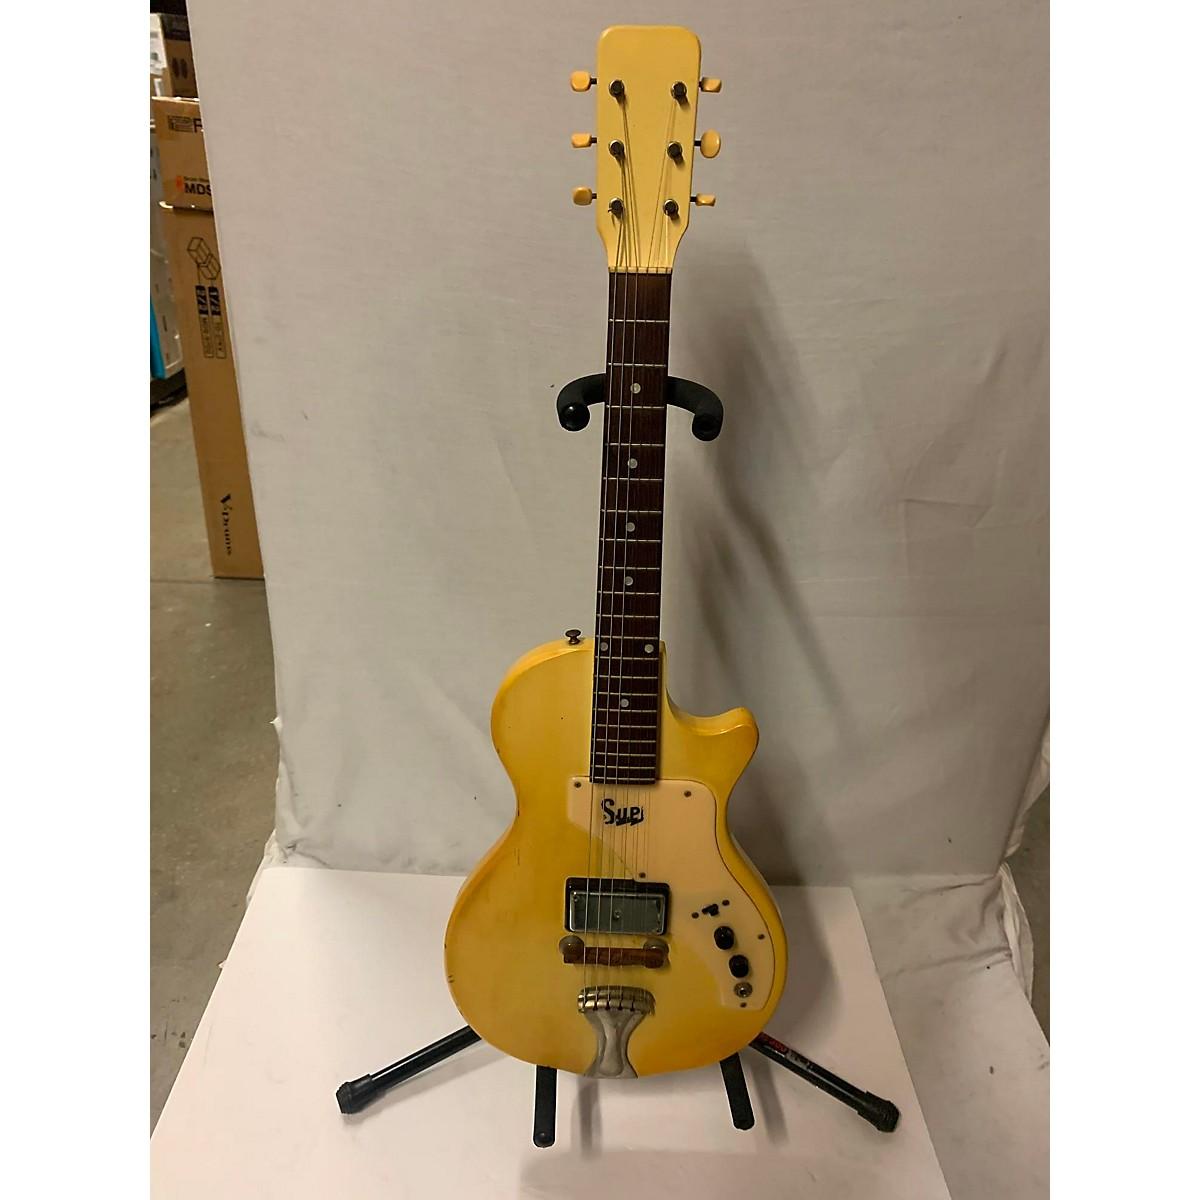 Supro 1962 1507 3/4 Electric Guitar